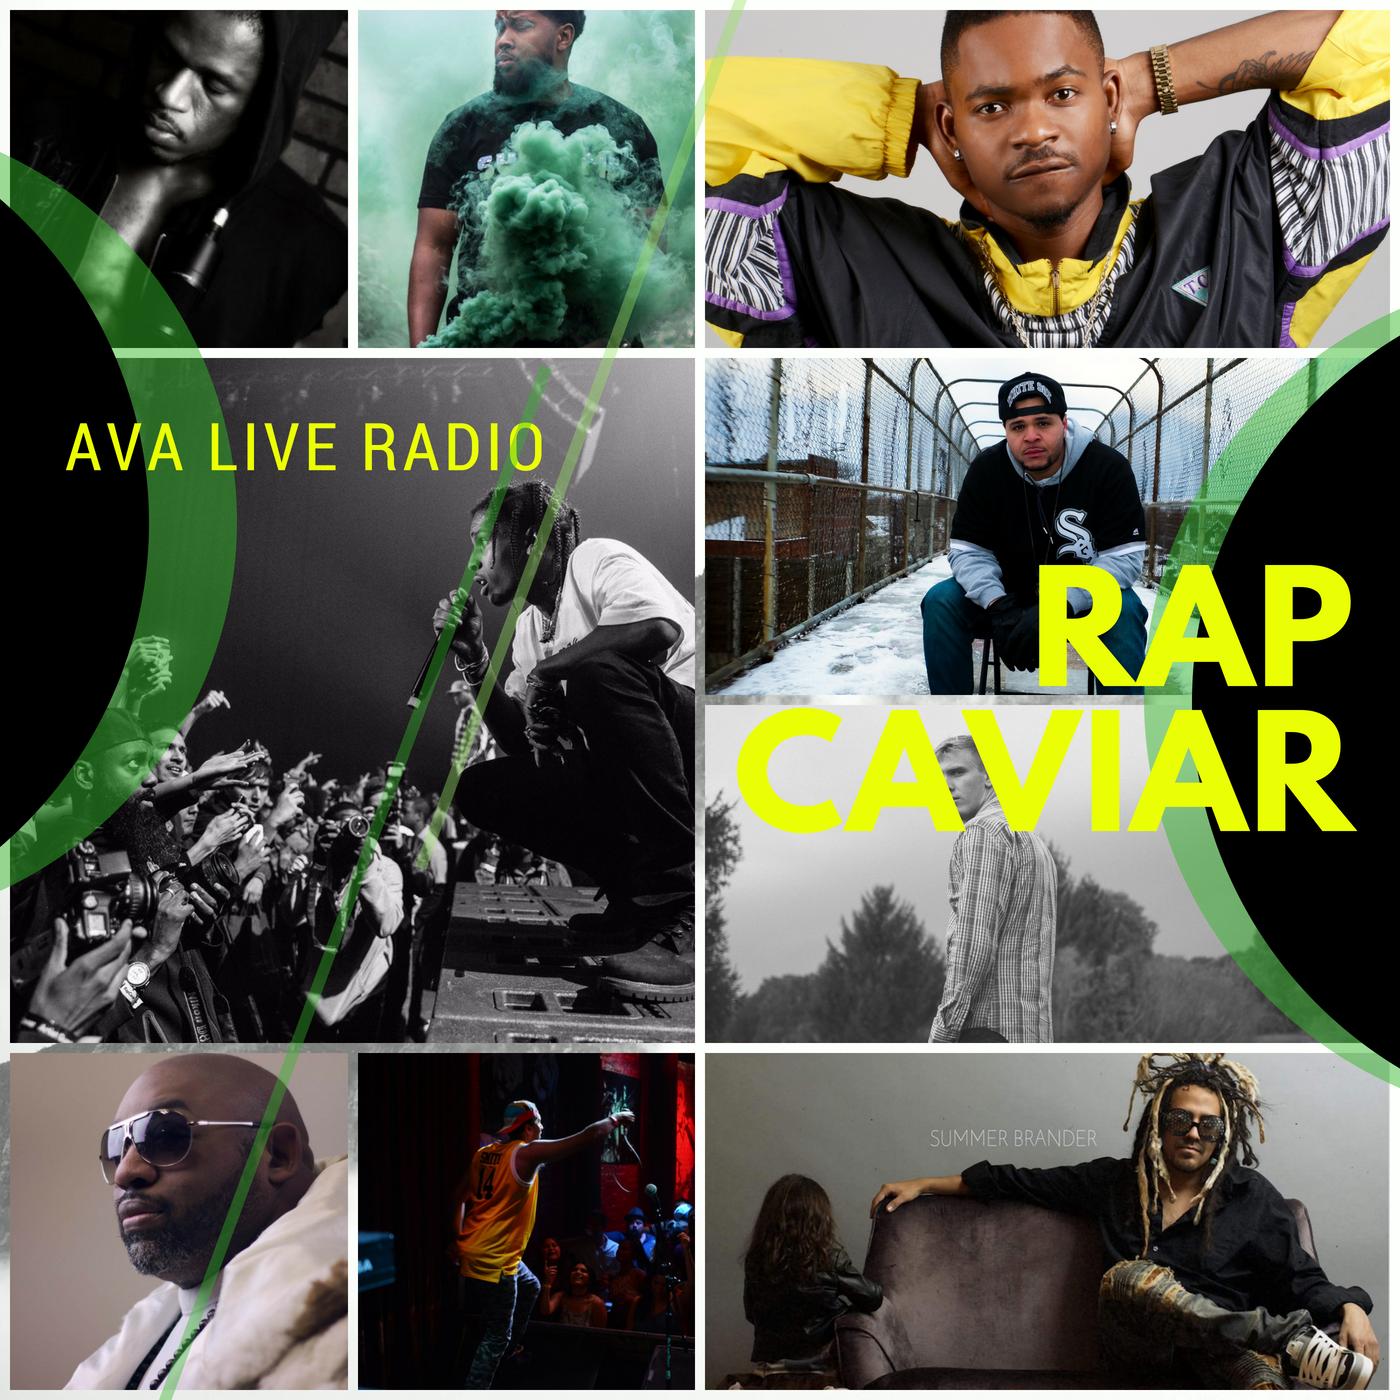 Rap caviar avaliveradio logo.png